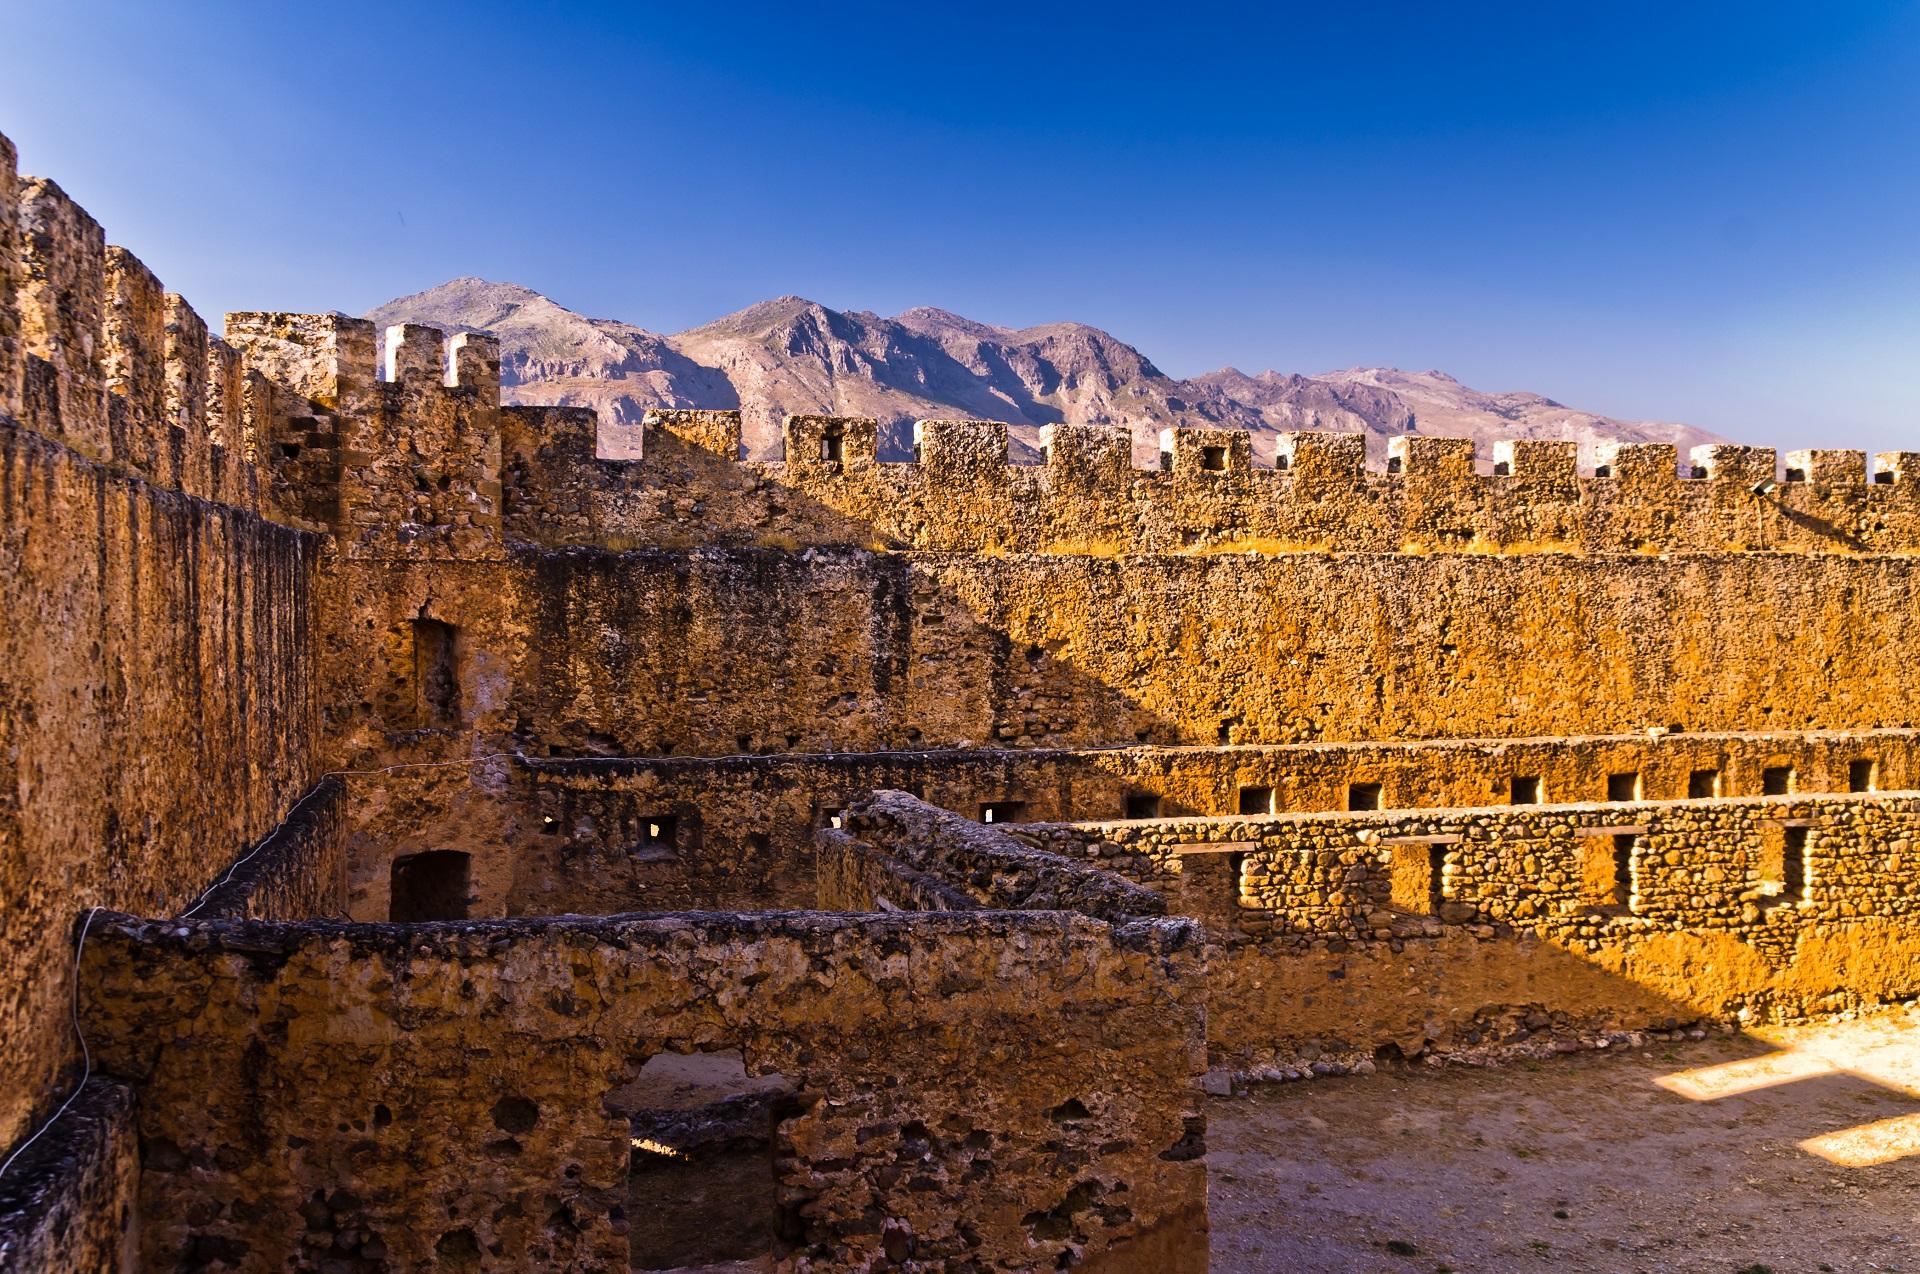 Frangokastello Castle in Crete